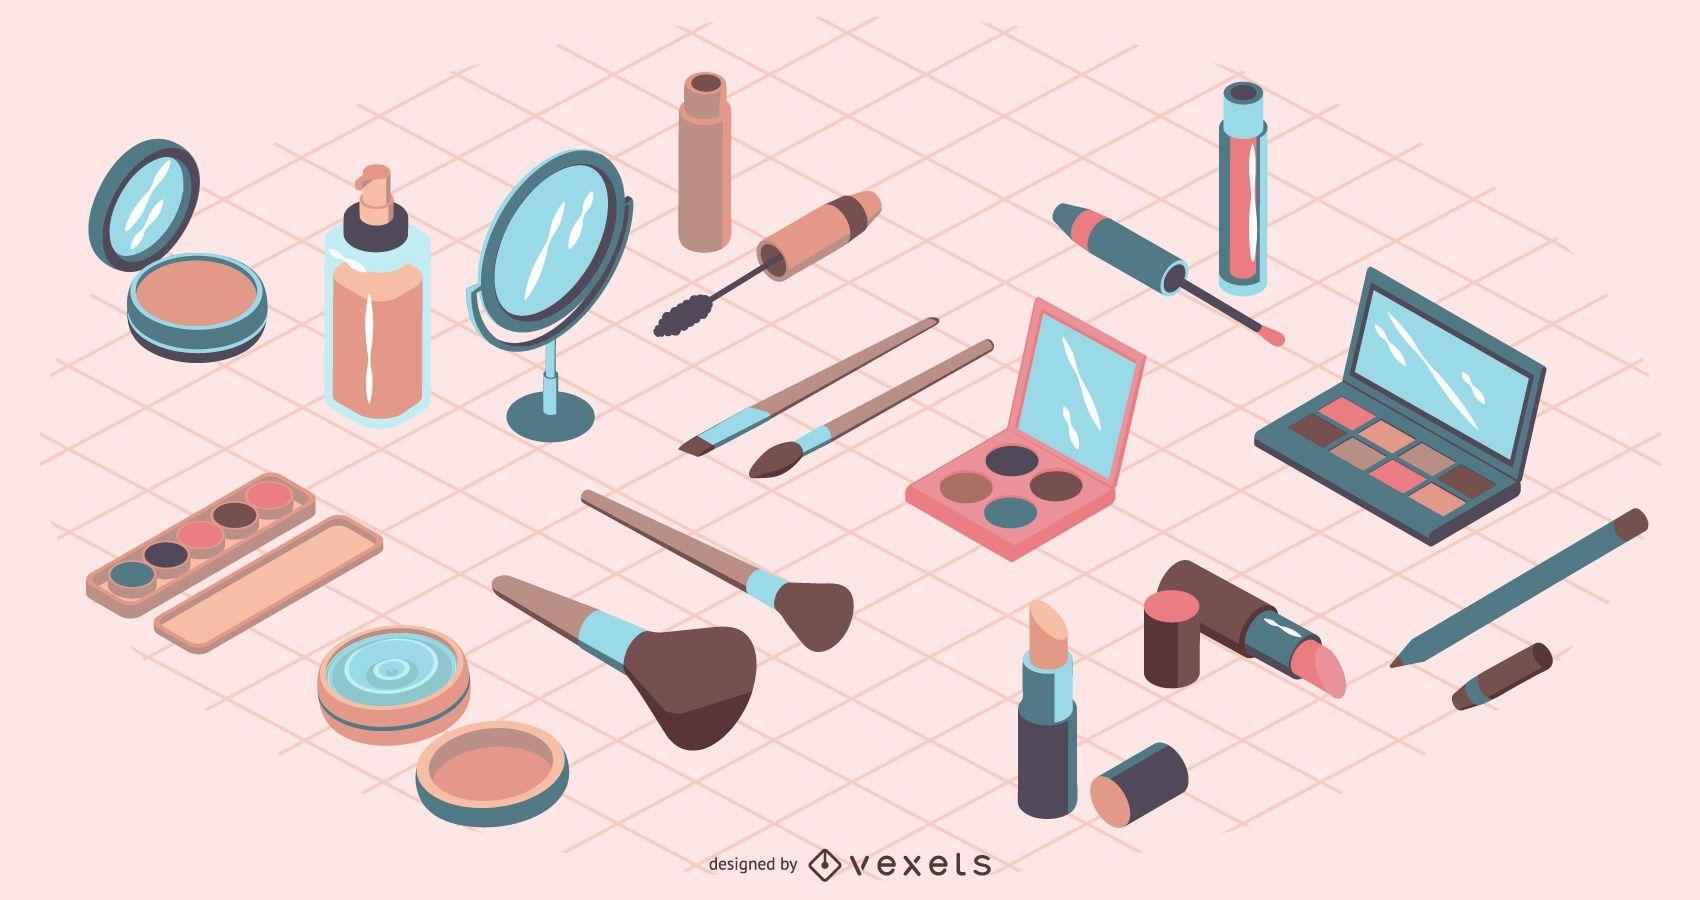 Elementos de maquillaje isométrico